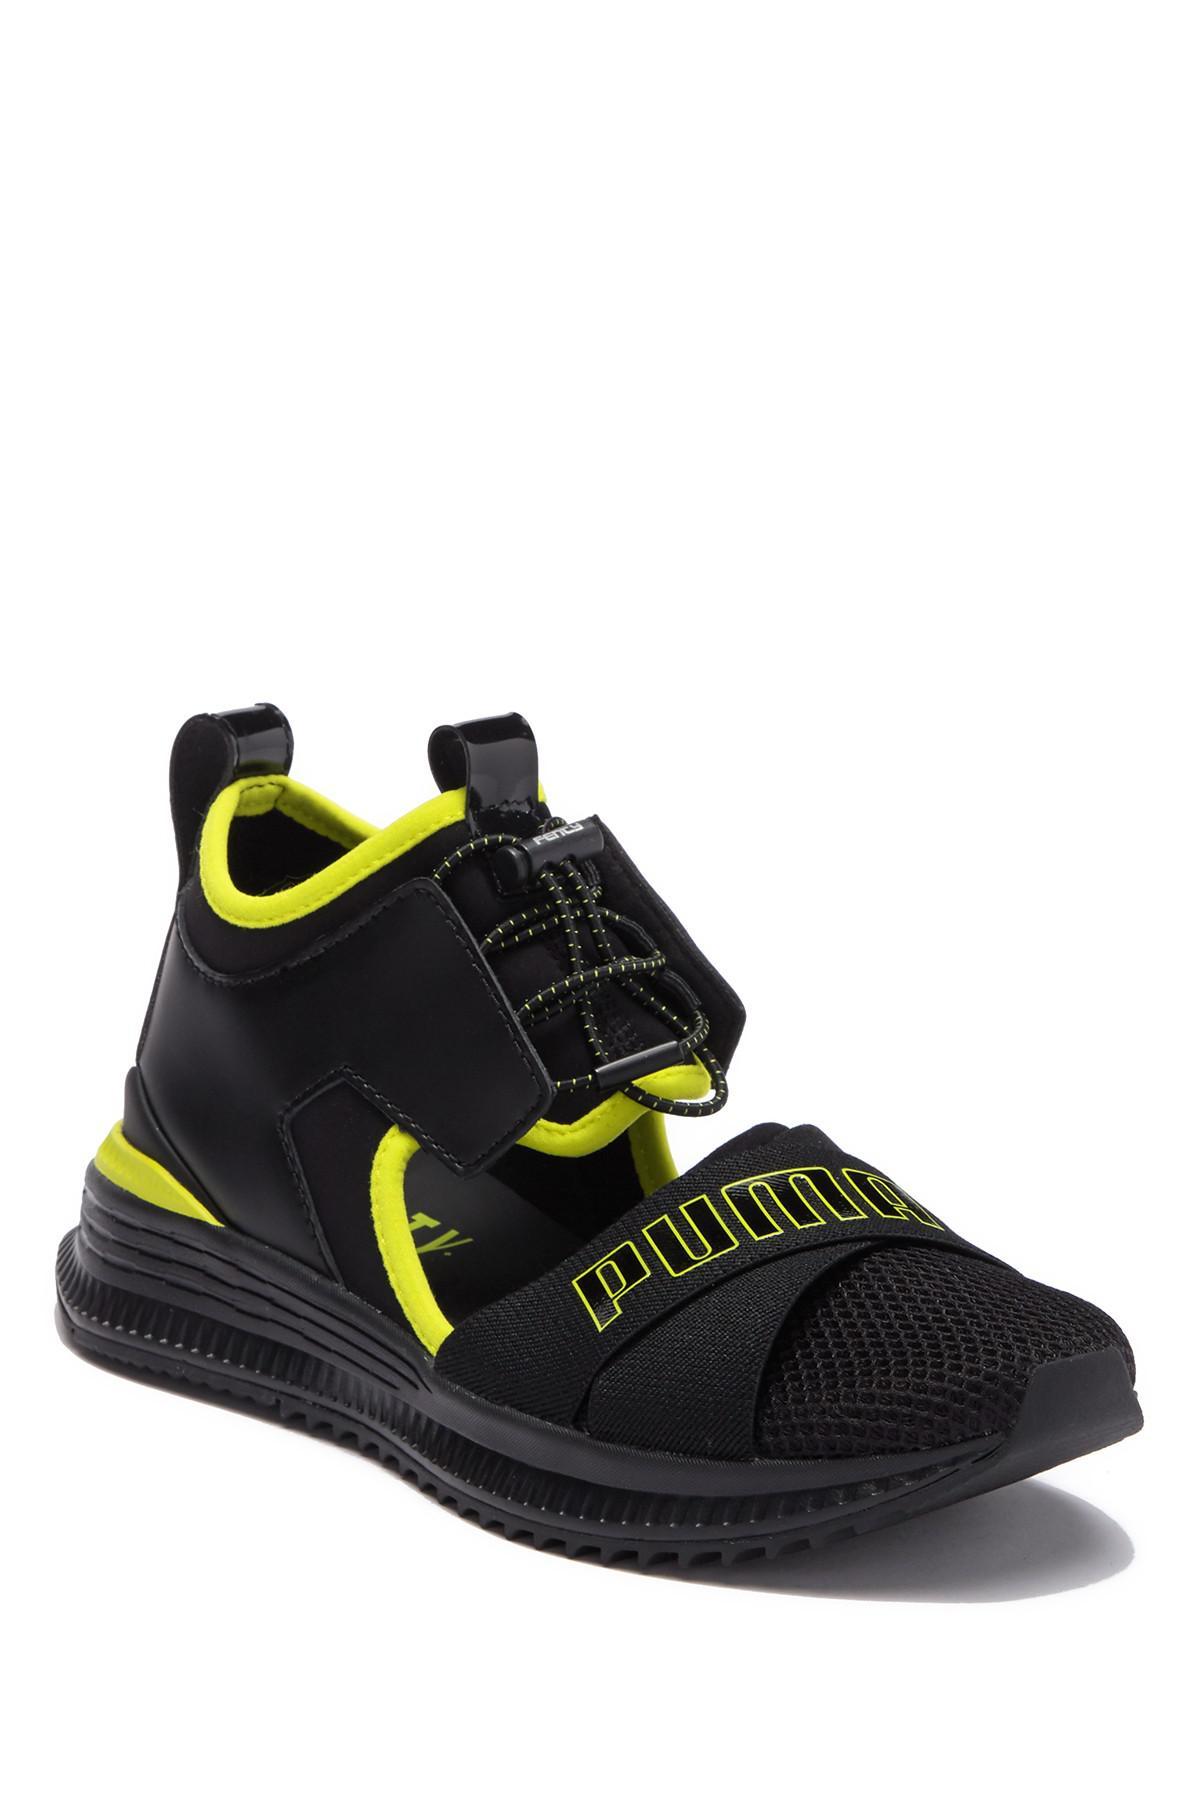 puma fenty avid sneakers